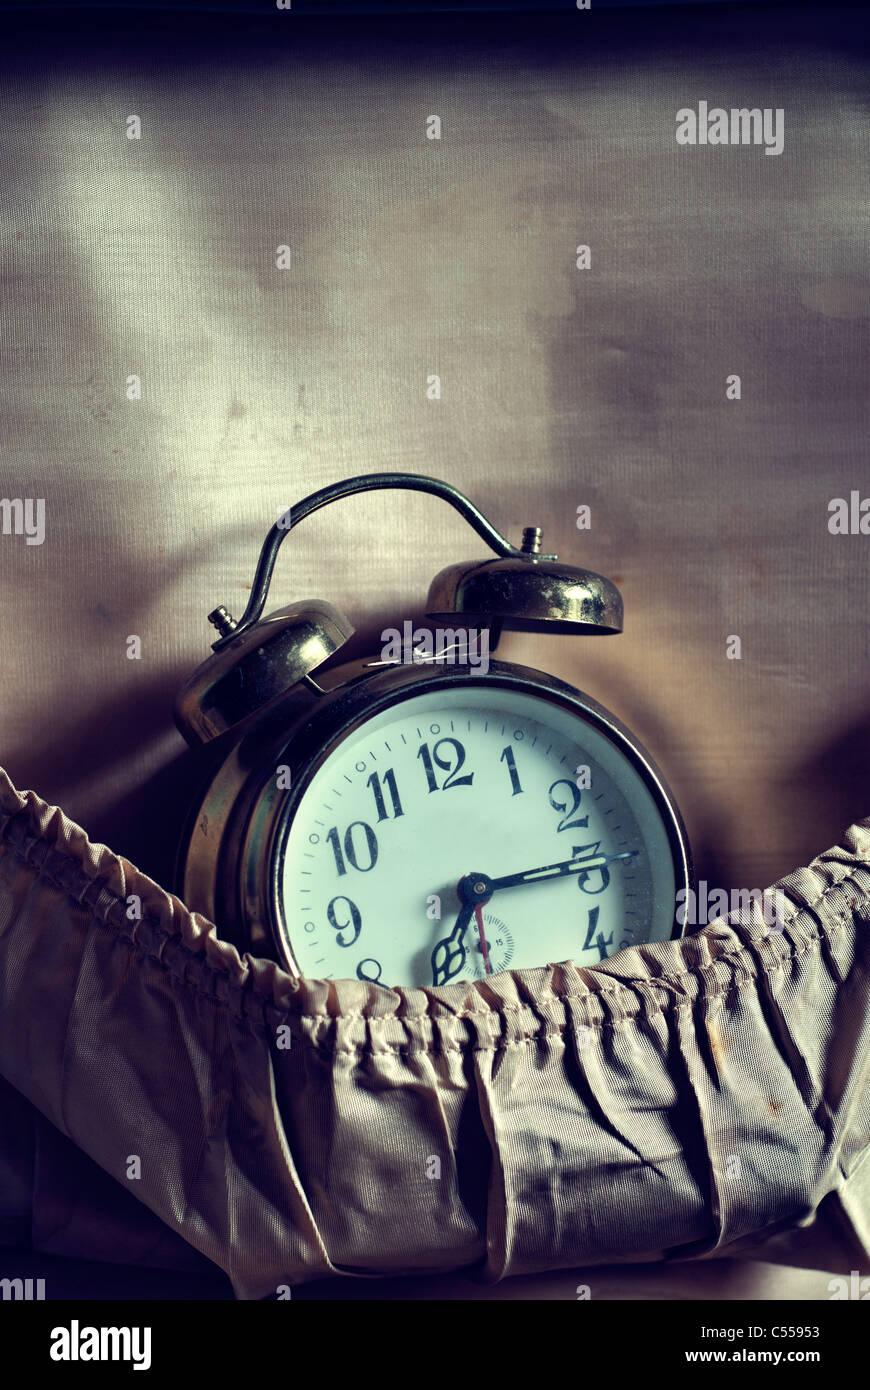 Vintage alarm clock in a suitcase pocket - Stock Image